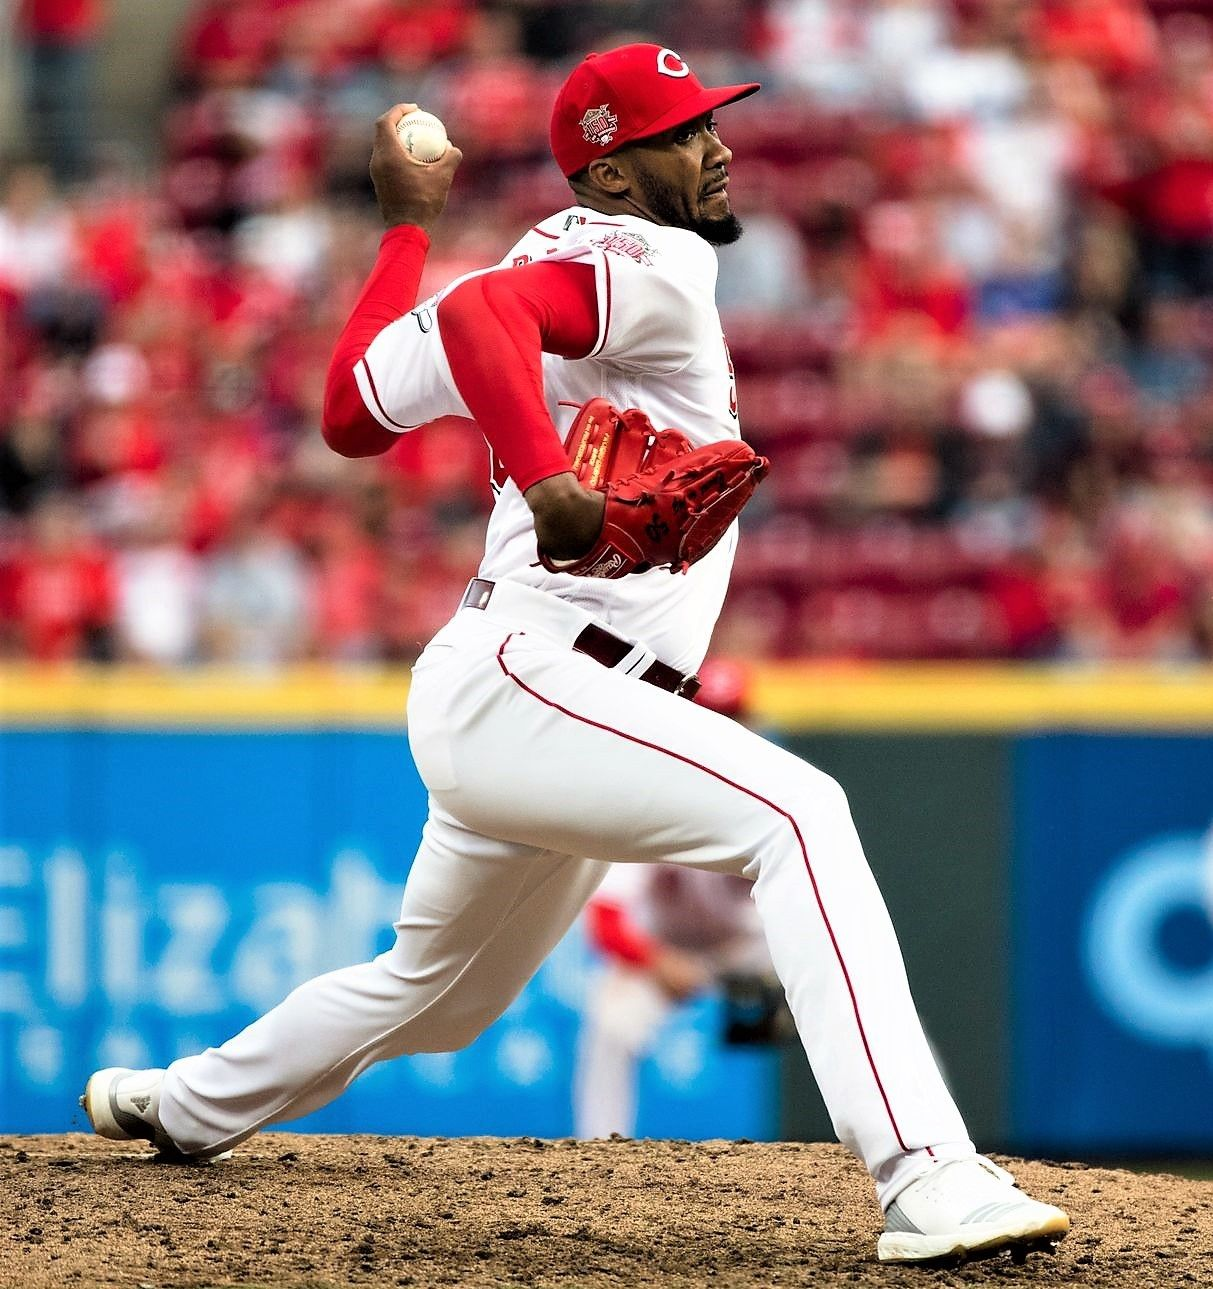 Cincinnati Reds Relief Pitcher Amir Garrett 50 Pitches In The Opening Day Mlb Baseball Game Between Cincinnati Re Cincinnati Reds Reds Opening Day Cincinnati